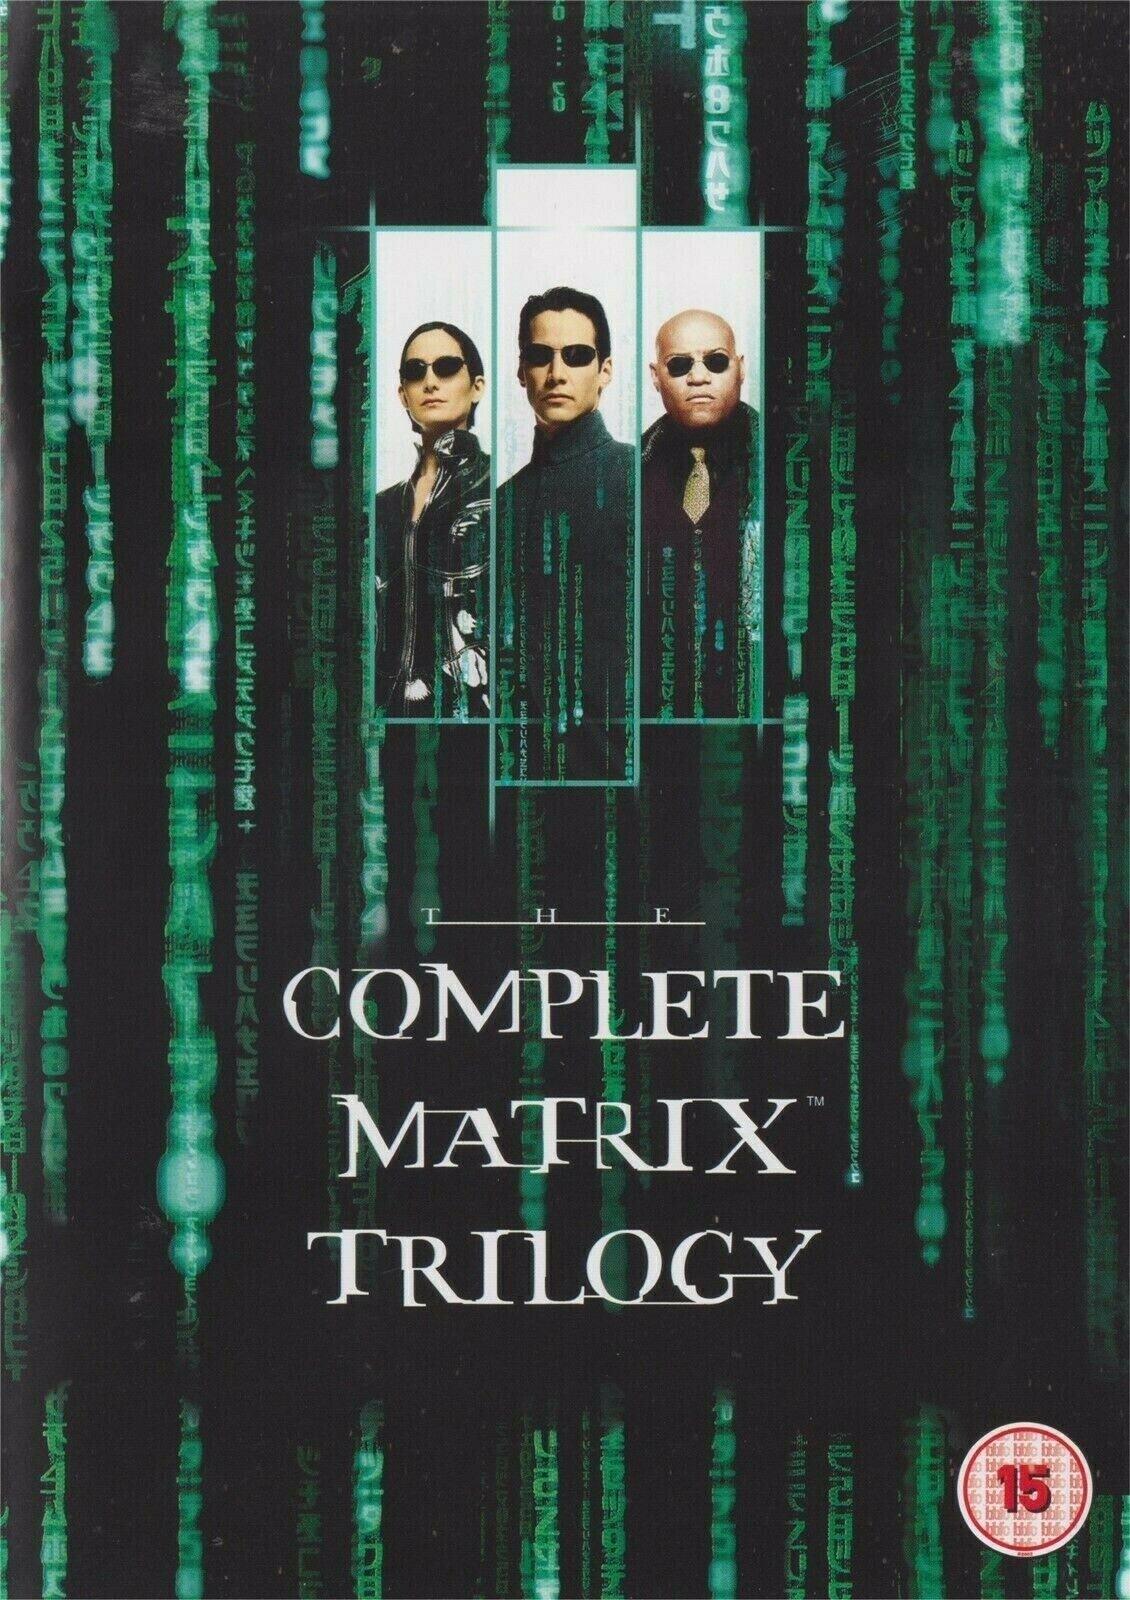 Matrix Trilogy - 3 Films Bundle in 4K (Stream via Apple TV) £9.99 @ iTunes Store